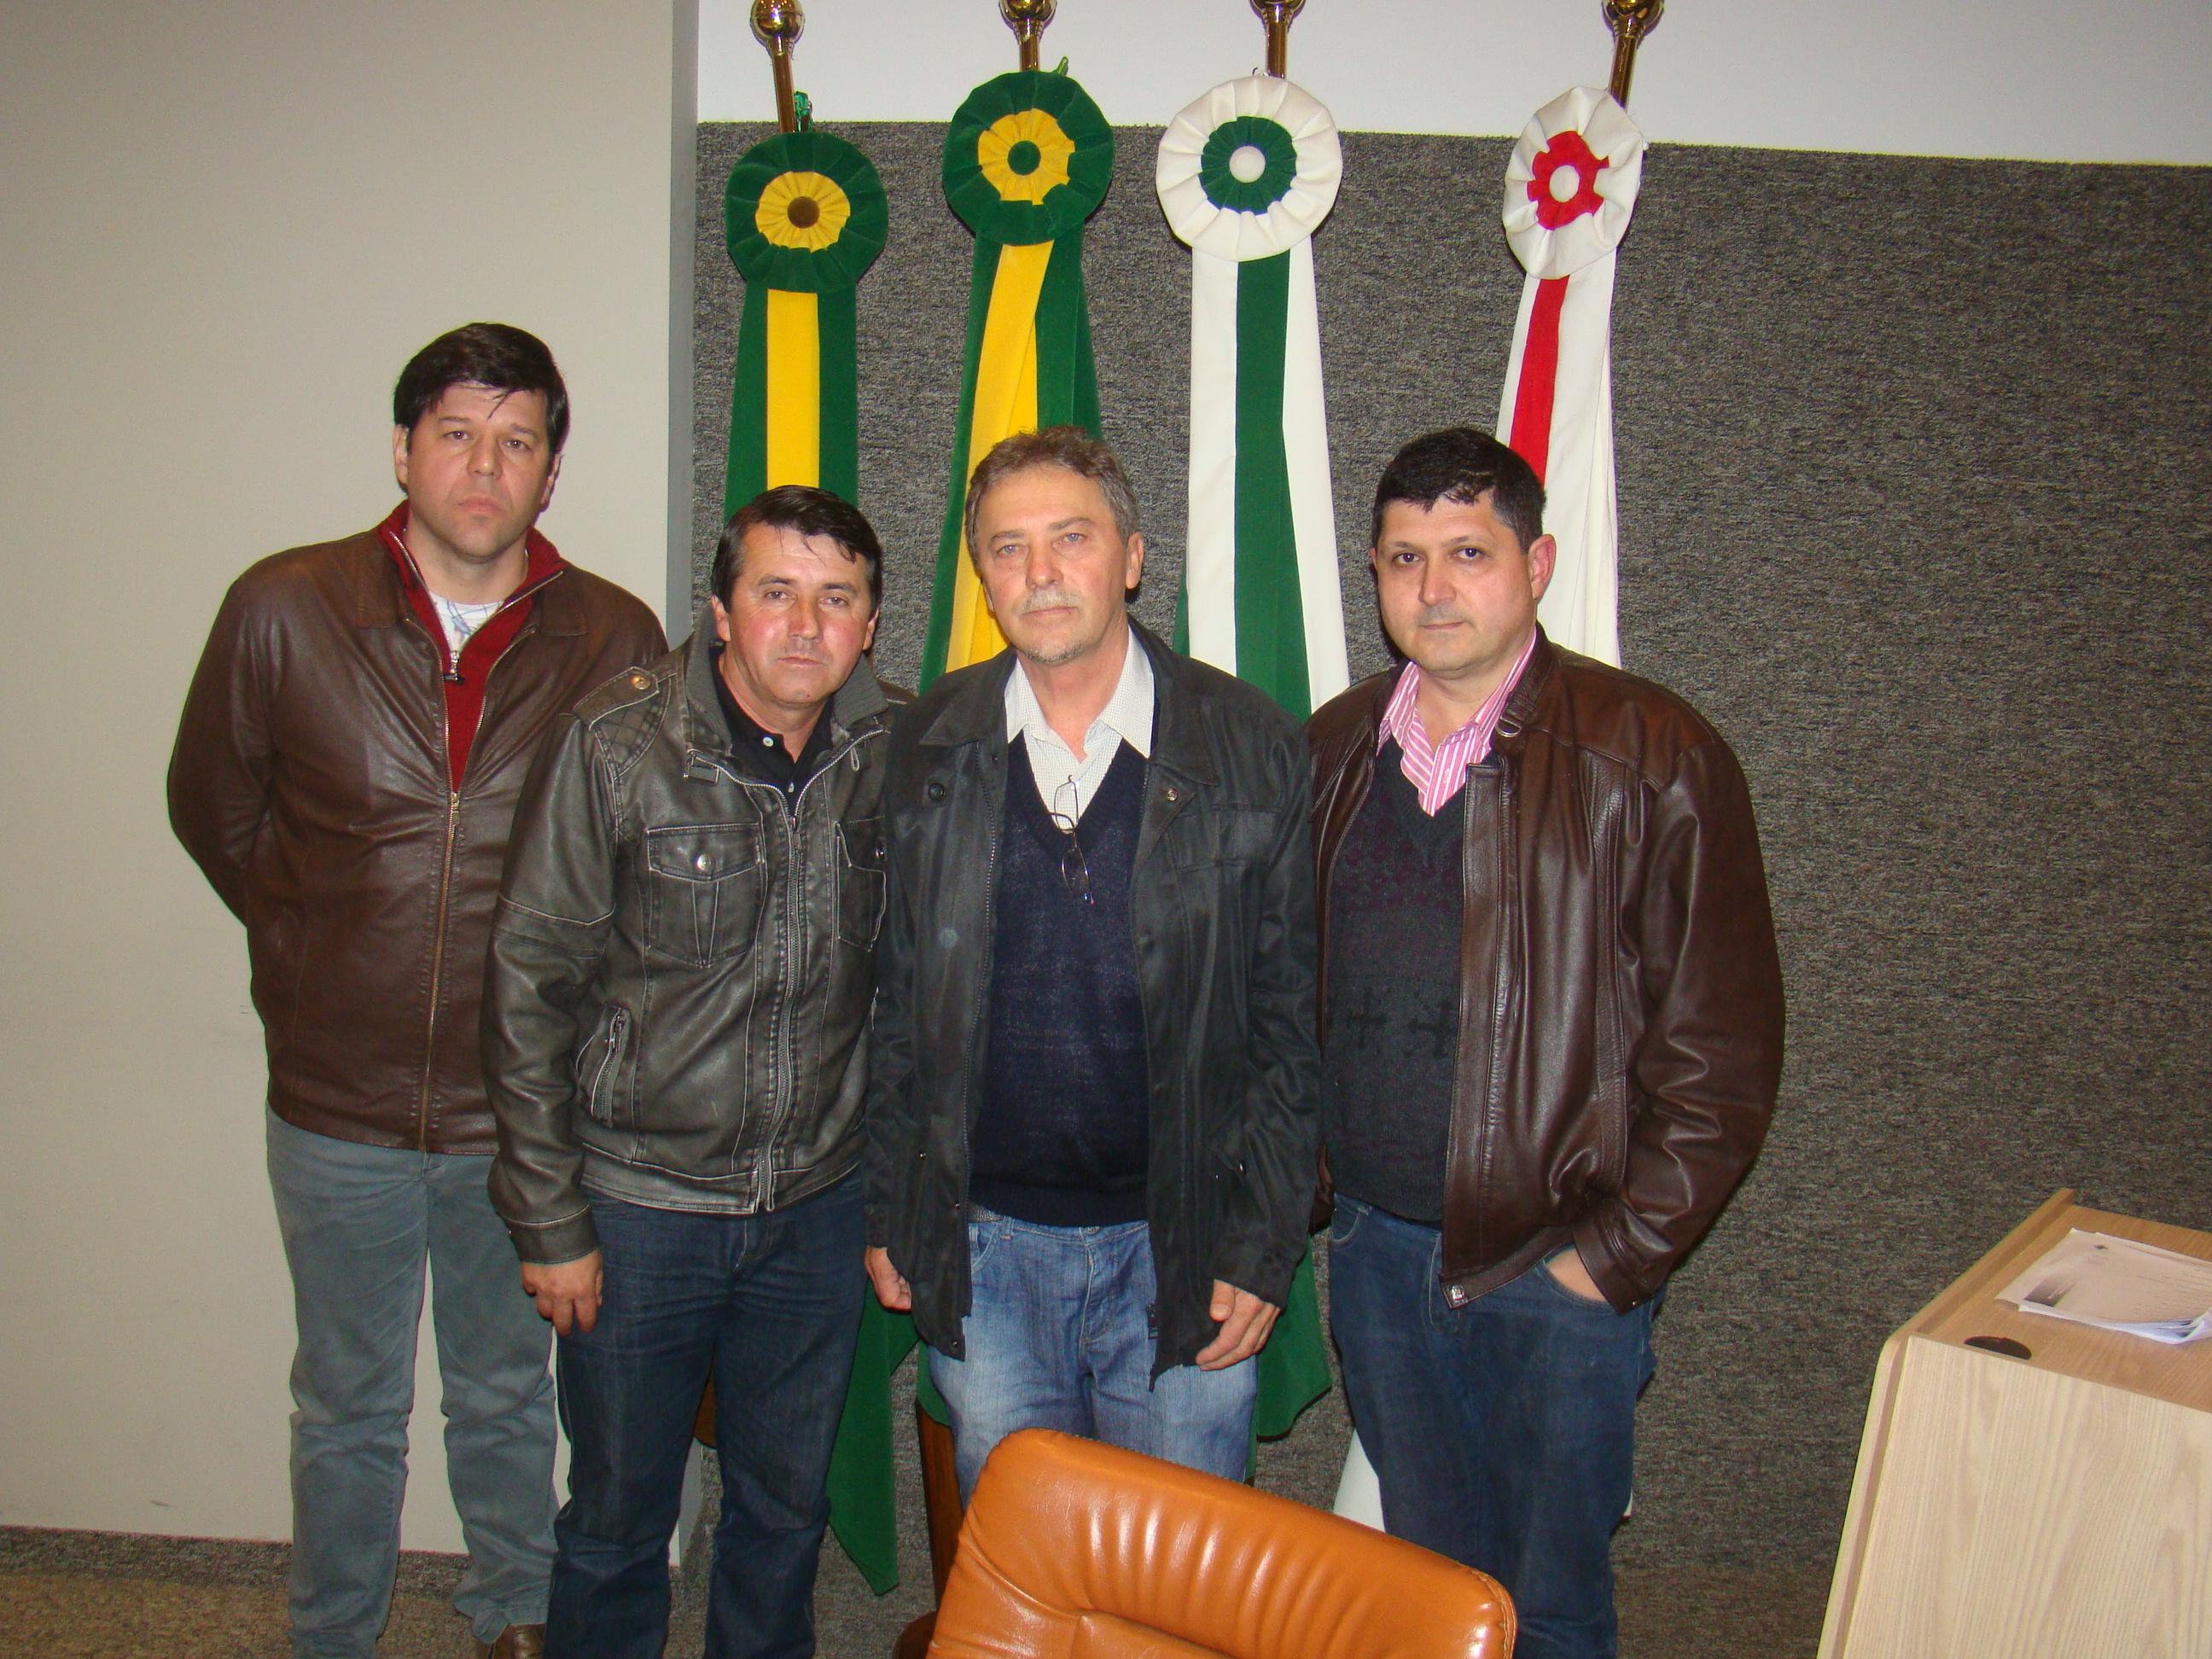 Osmar Pereira com os componentes da Mesa, Vereadores Dr. Darley, Marcos Vin�cio e Presidente Jos� Adilson